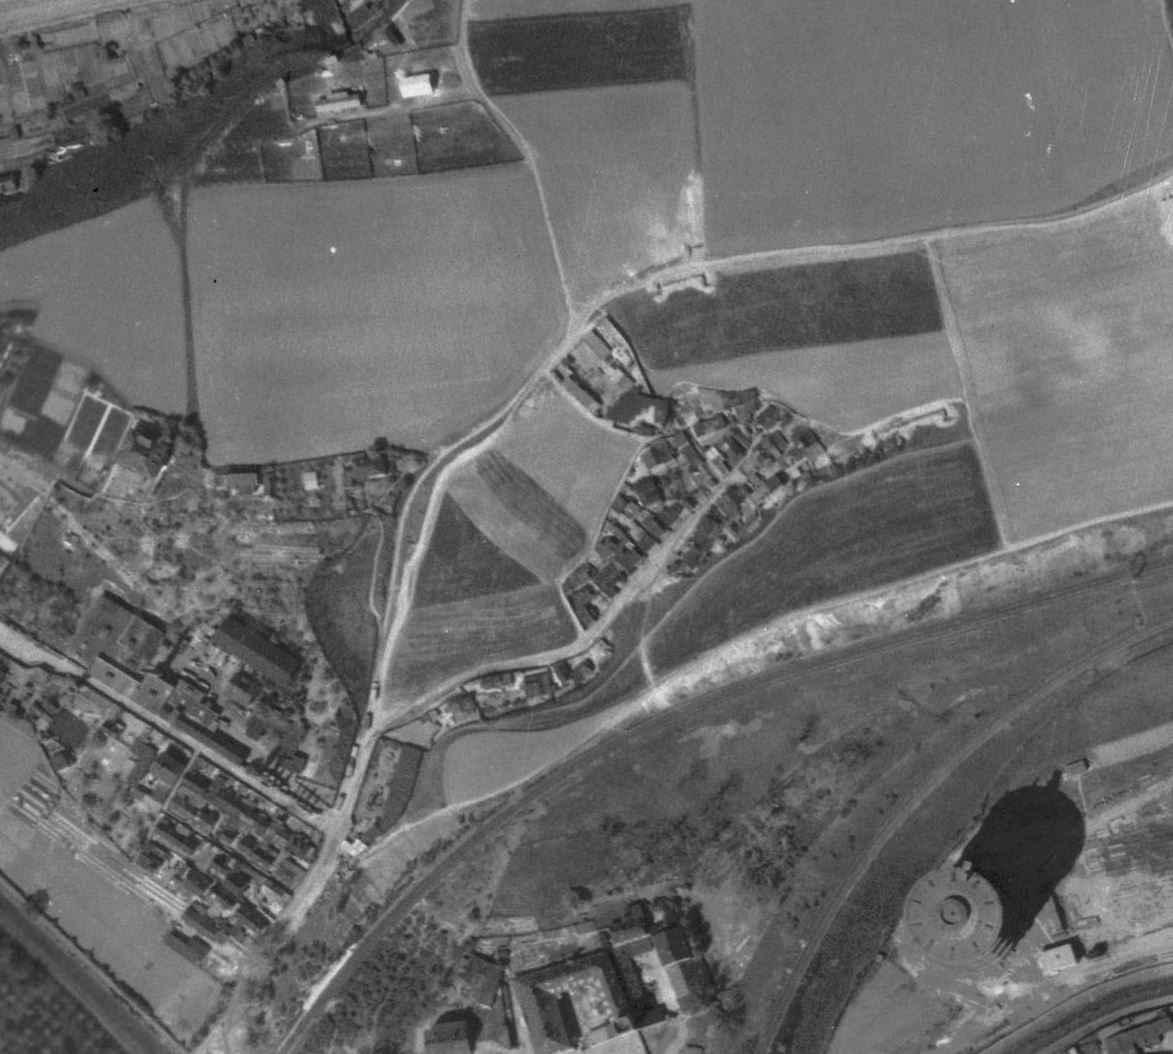 nouzova-kolonie-udoli-desu-letecky-snimek-1945